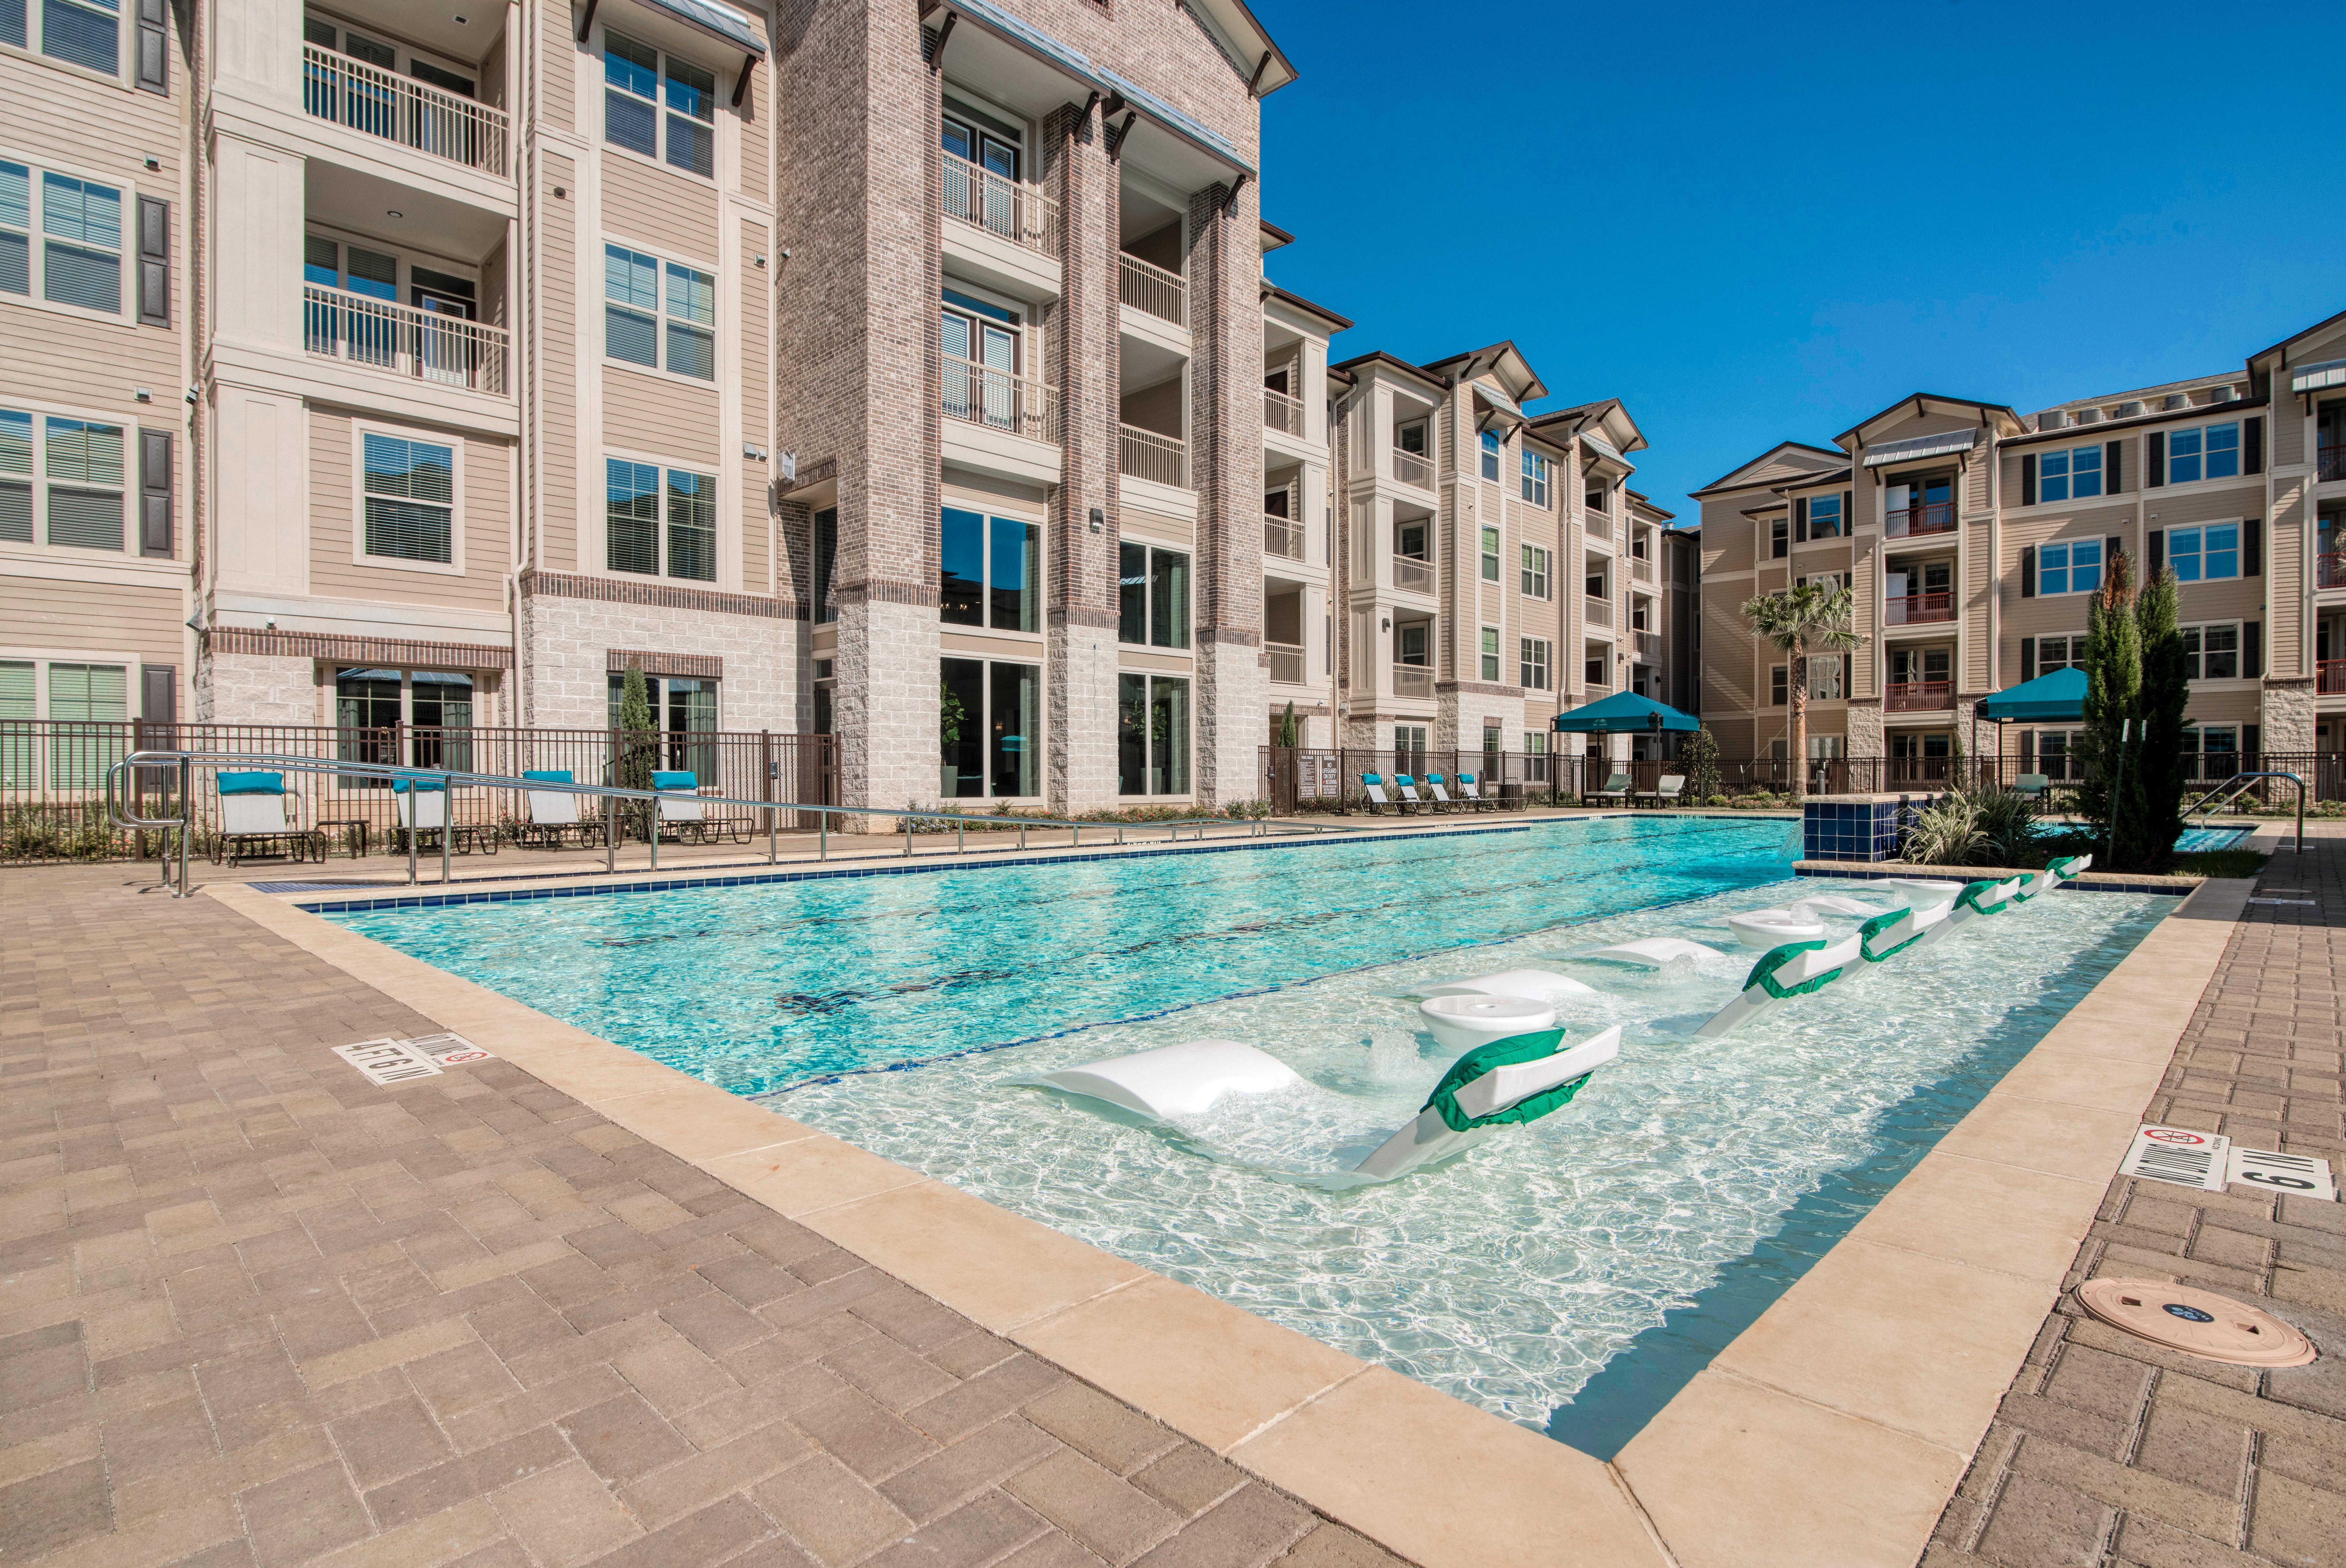 Apartments Near ITT Technical Institute-Houston North Augusta Woods: 55+ ADULT COMMUNITY for ITT Technical Institute-Houston North Students in Houston, TX